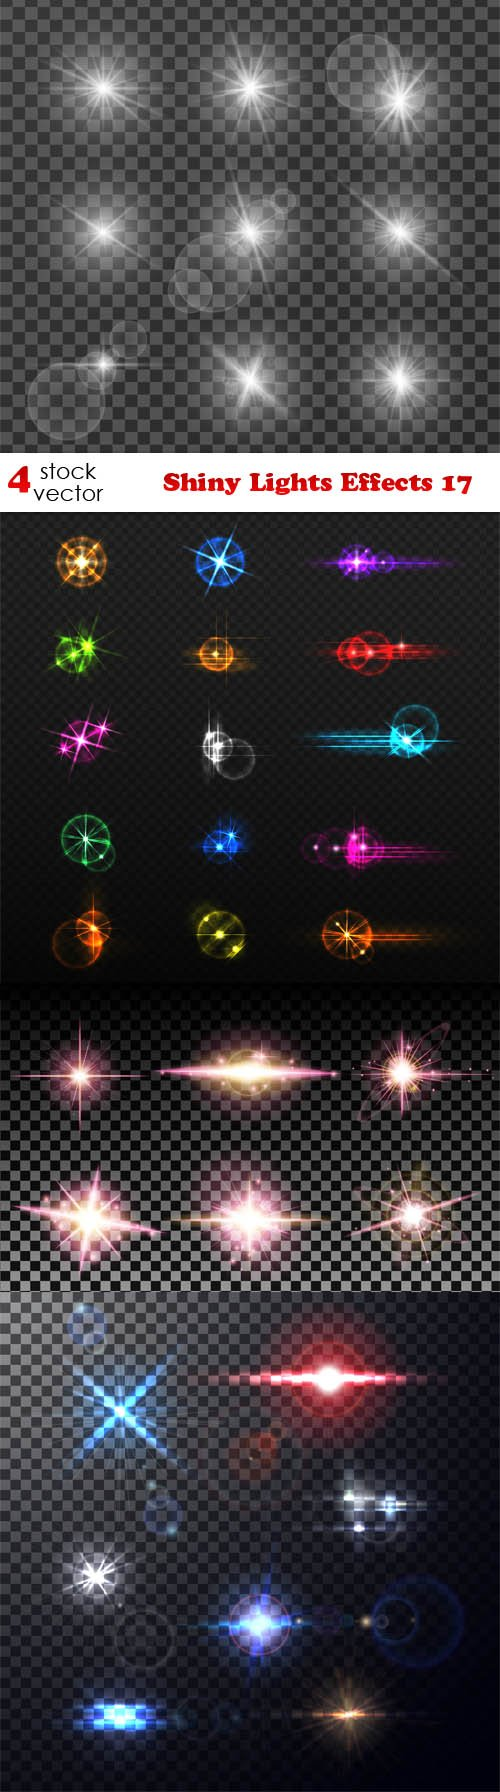 Vectors - Shiny Lights Effects 17